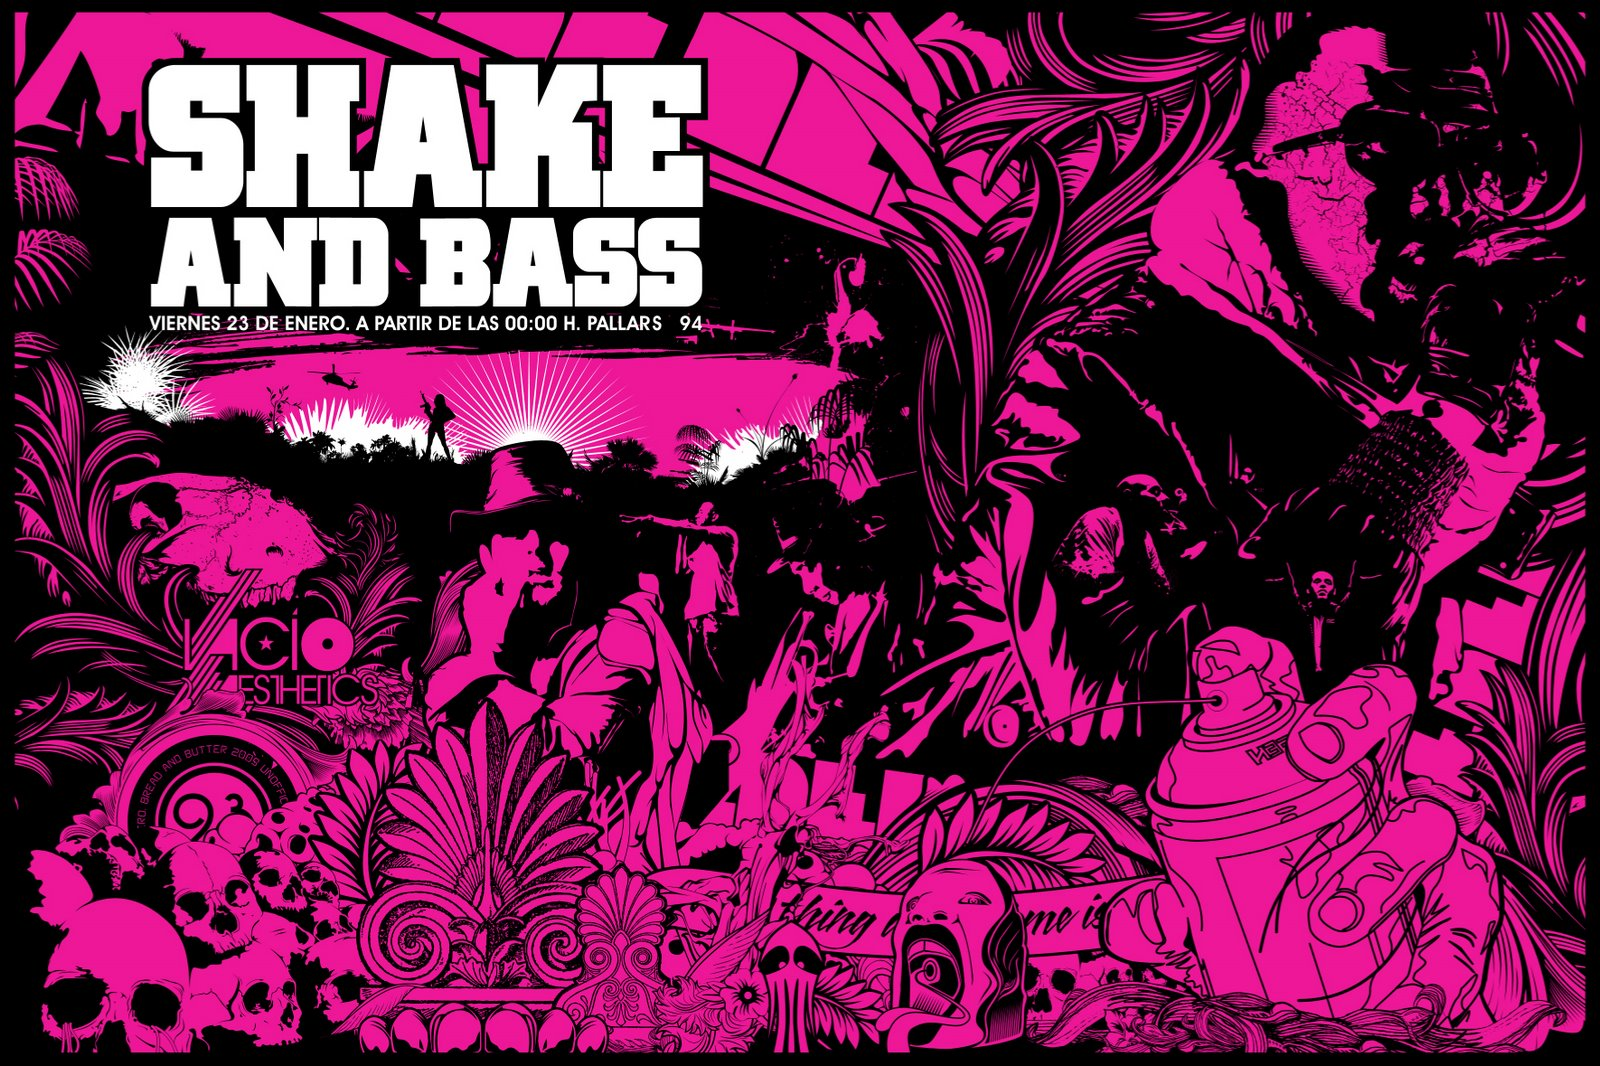 SHAKE AND BASS